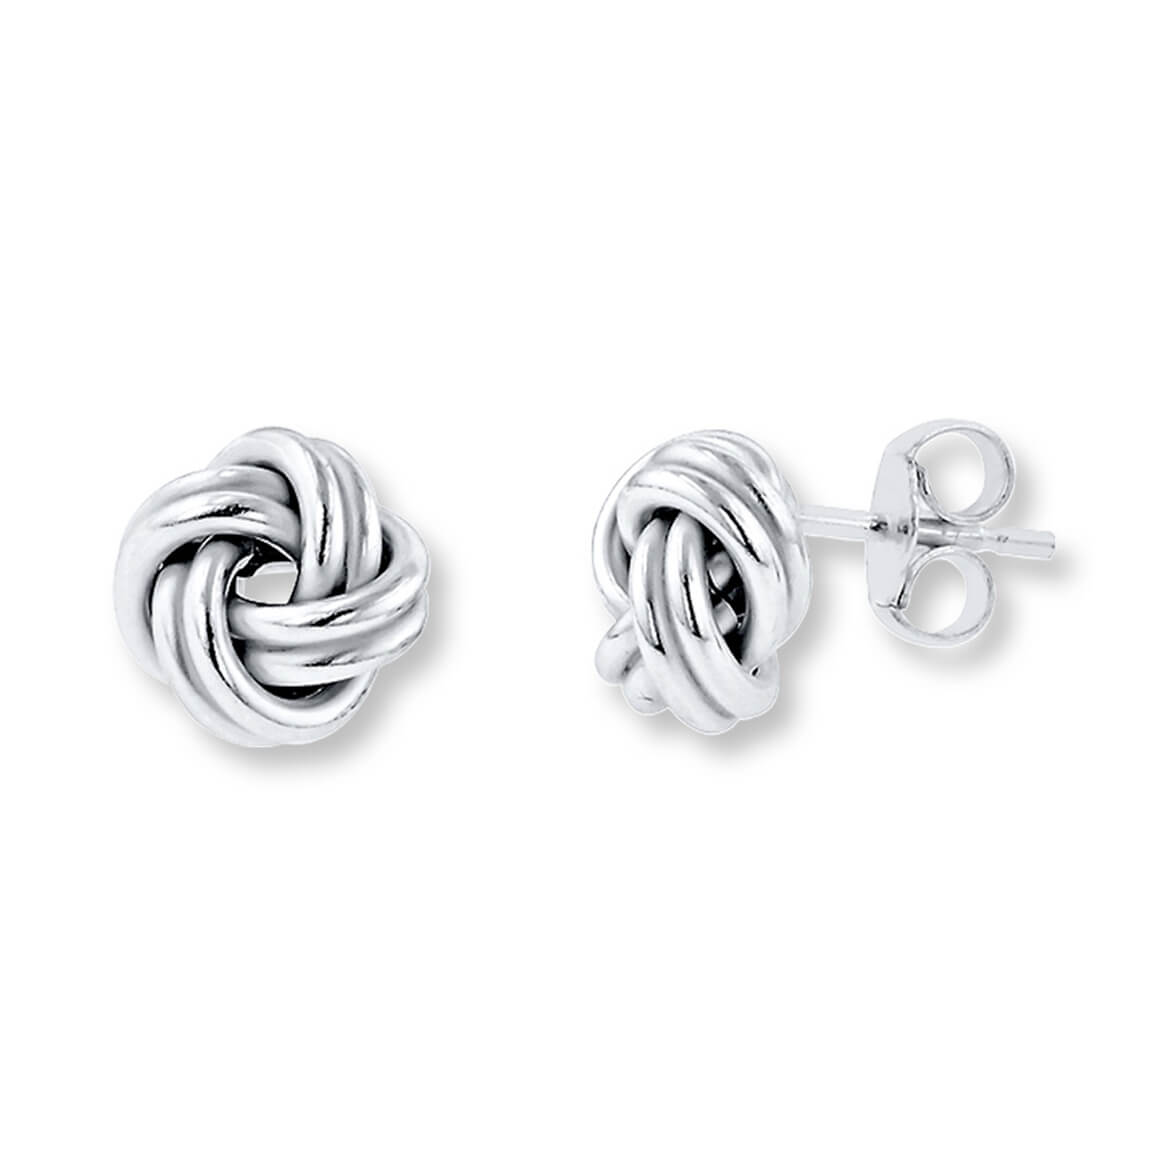 Love Knot Stud Earrings          VR